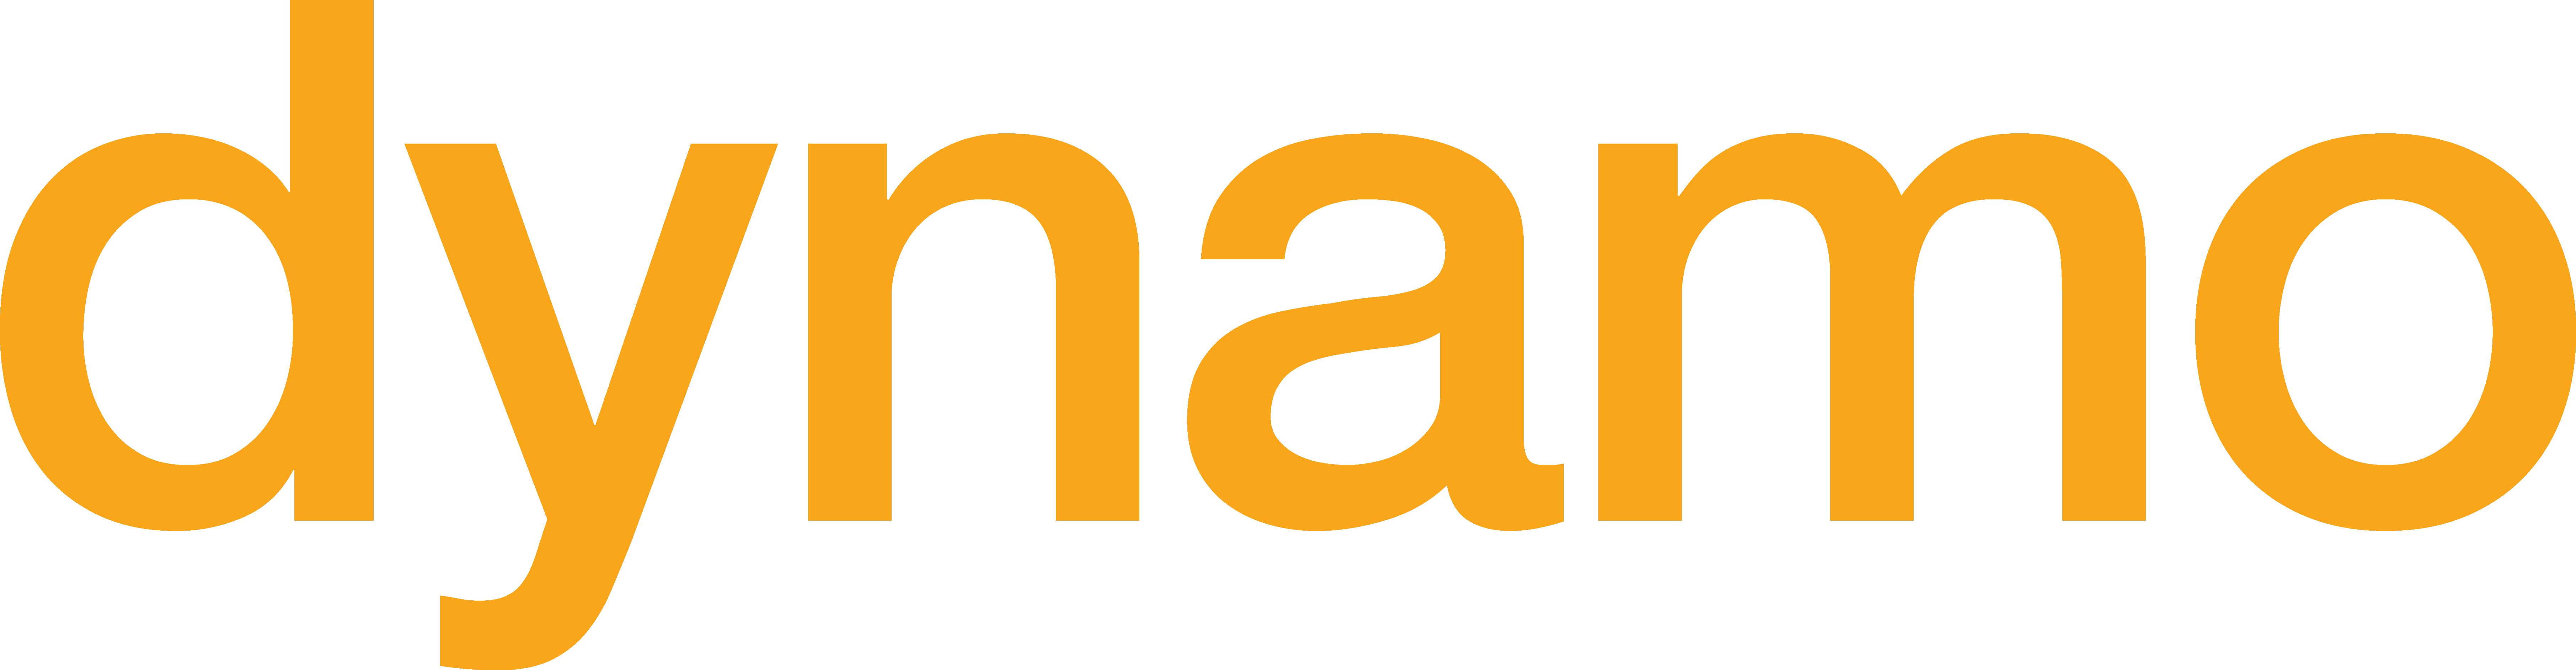 Logo for dynamo cycling